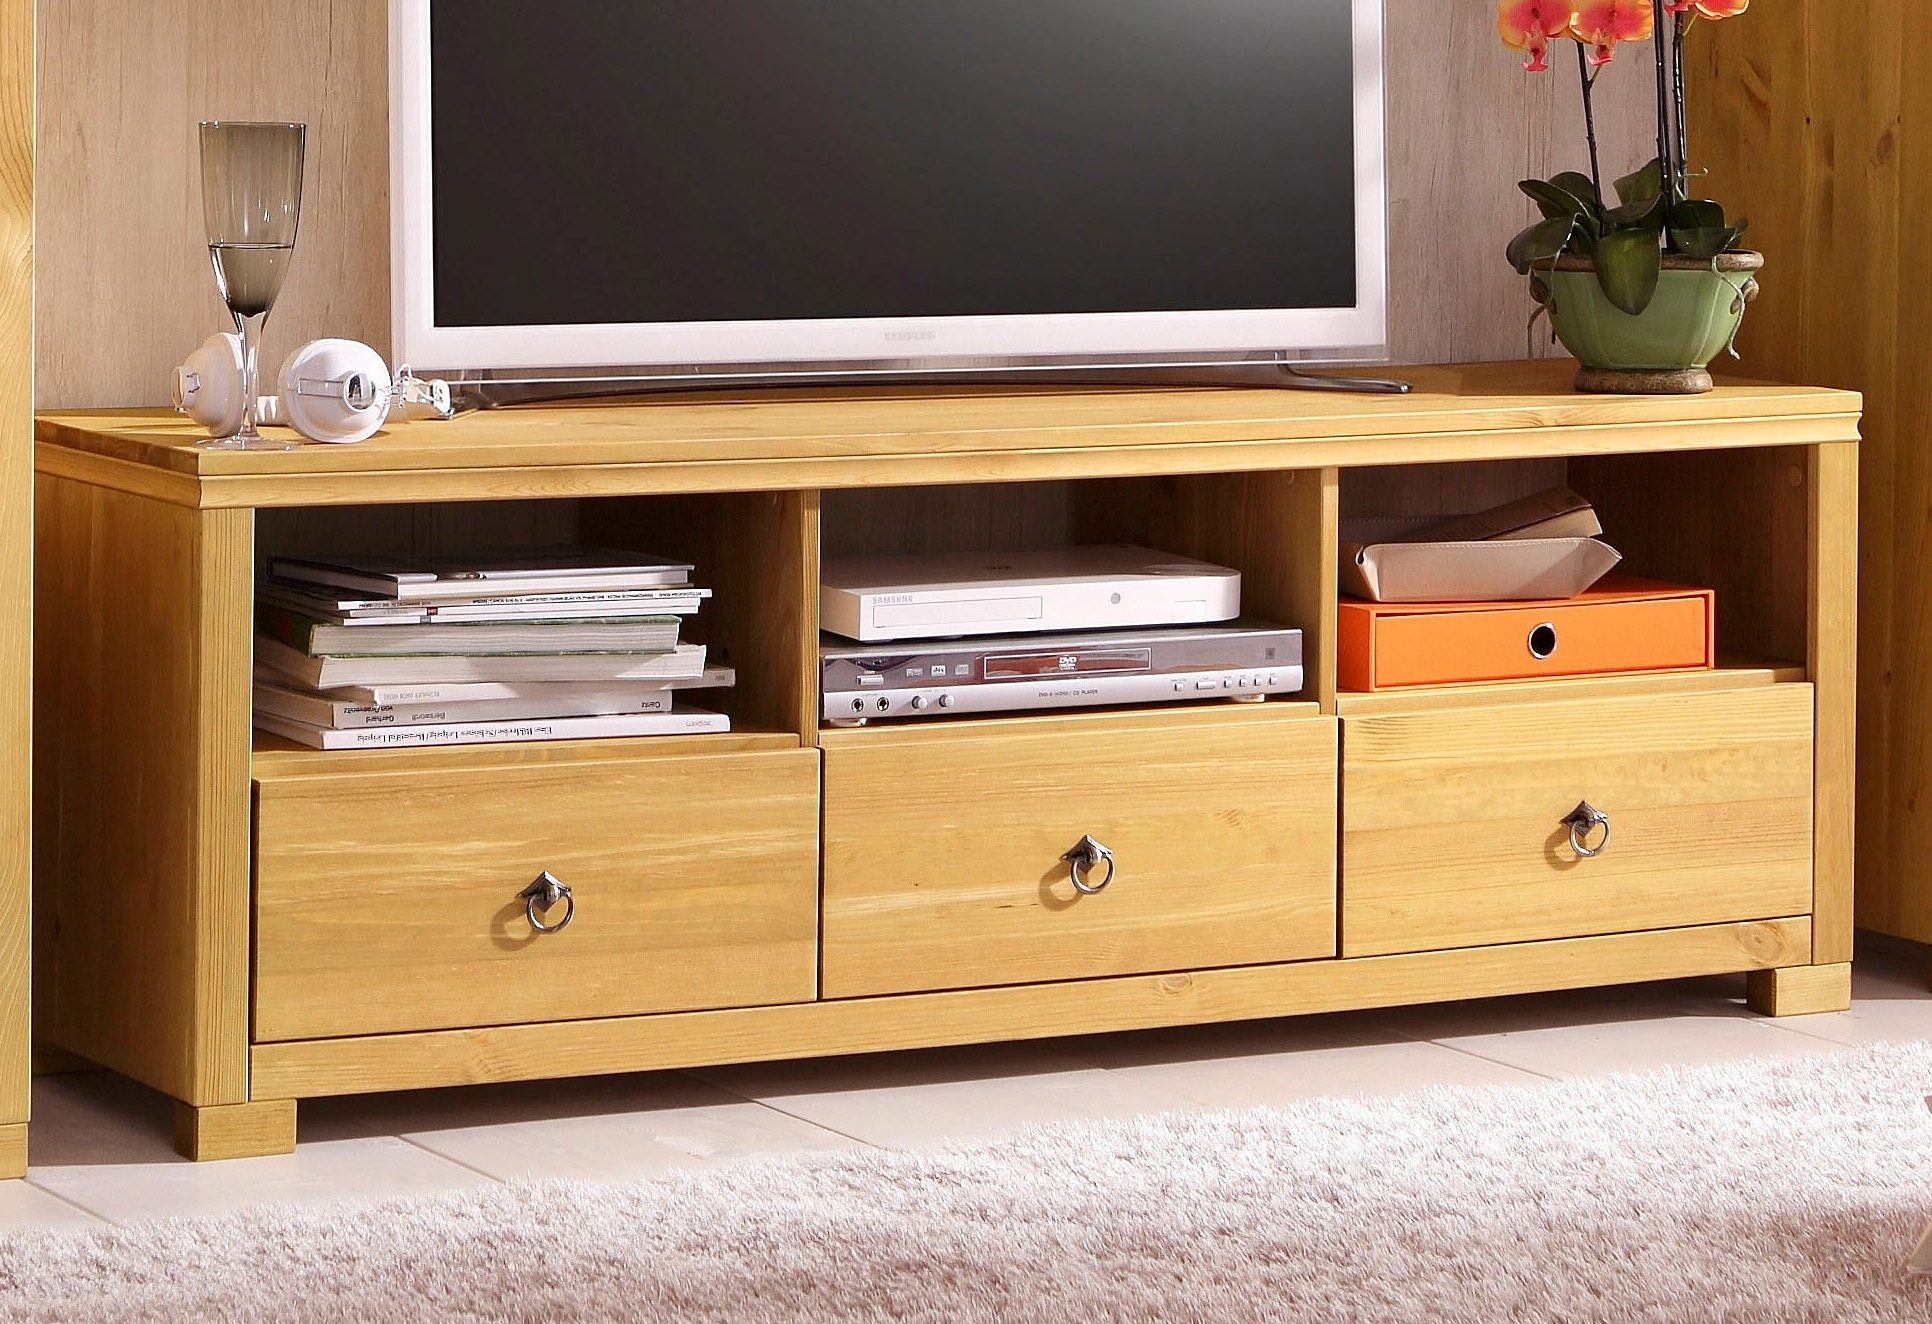 Home Affaire TV-lowboard Gotland breedte 147 cm goedkoop op otto.nl kopen